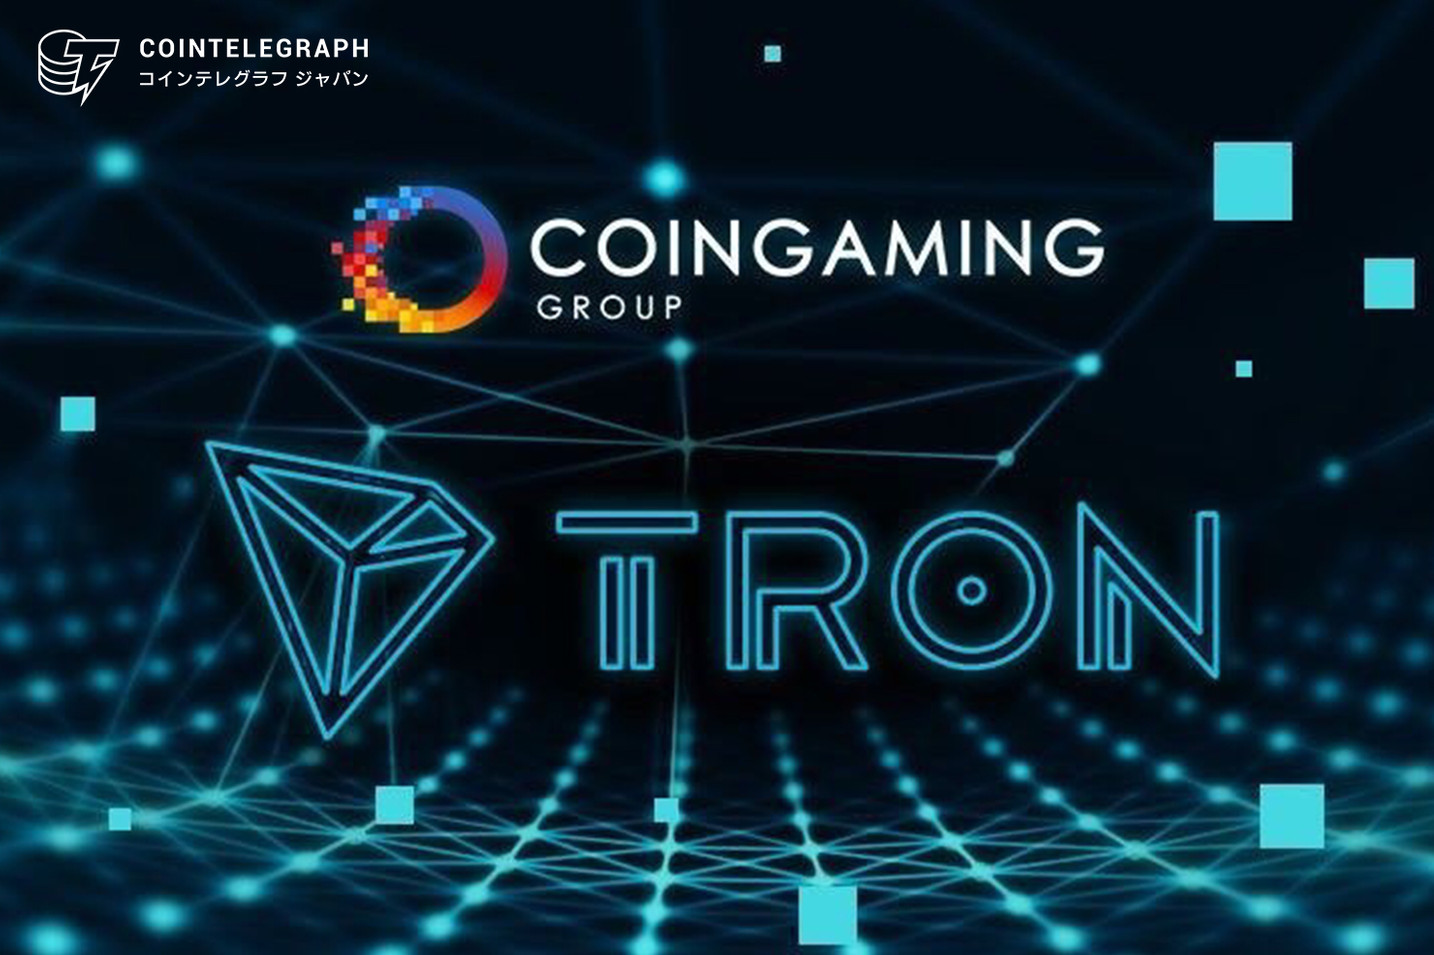 Coingamingグループがトロン財団と提携 TRXゲームの新境地拓く